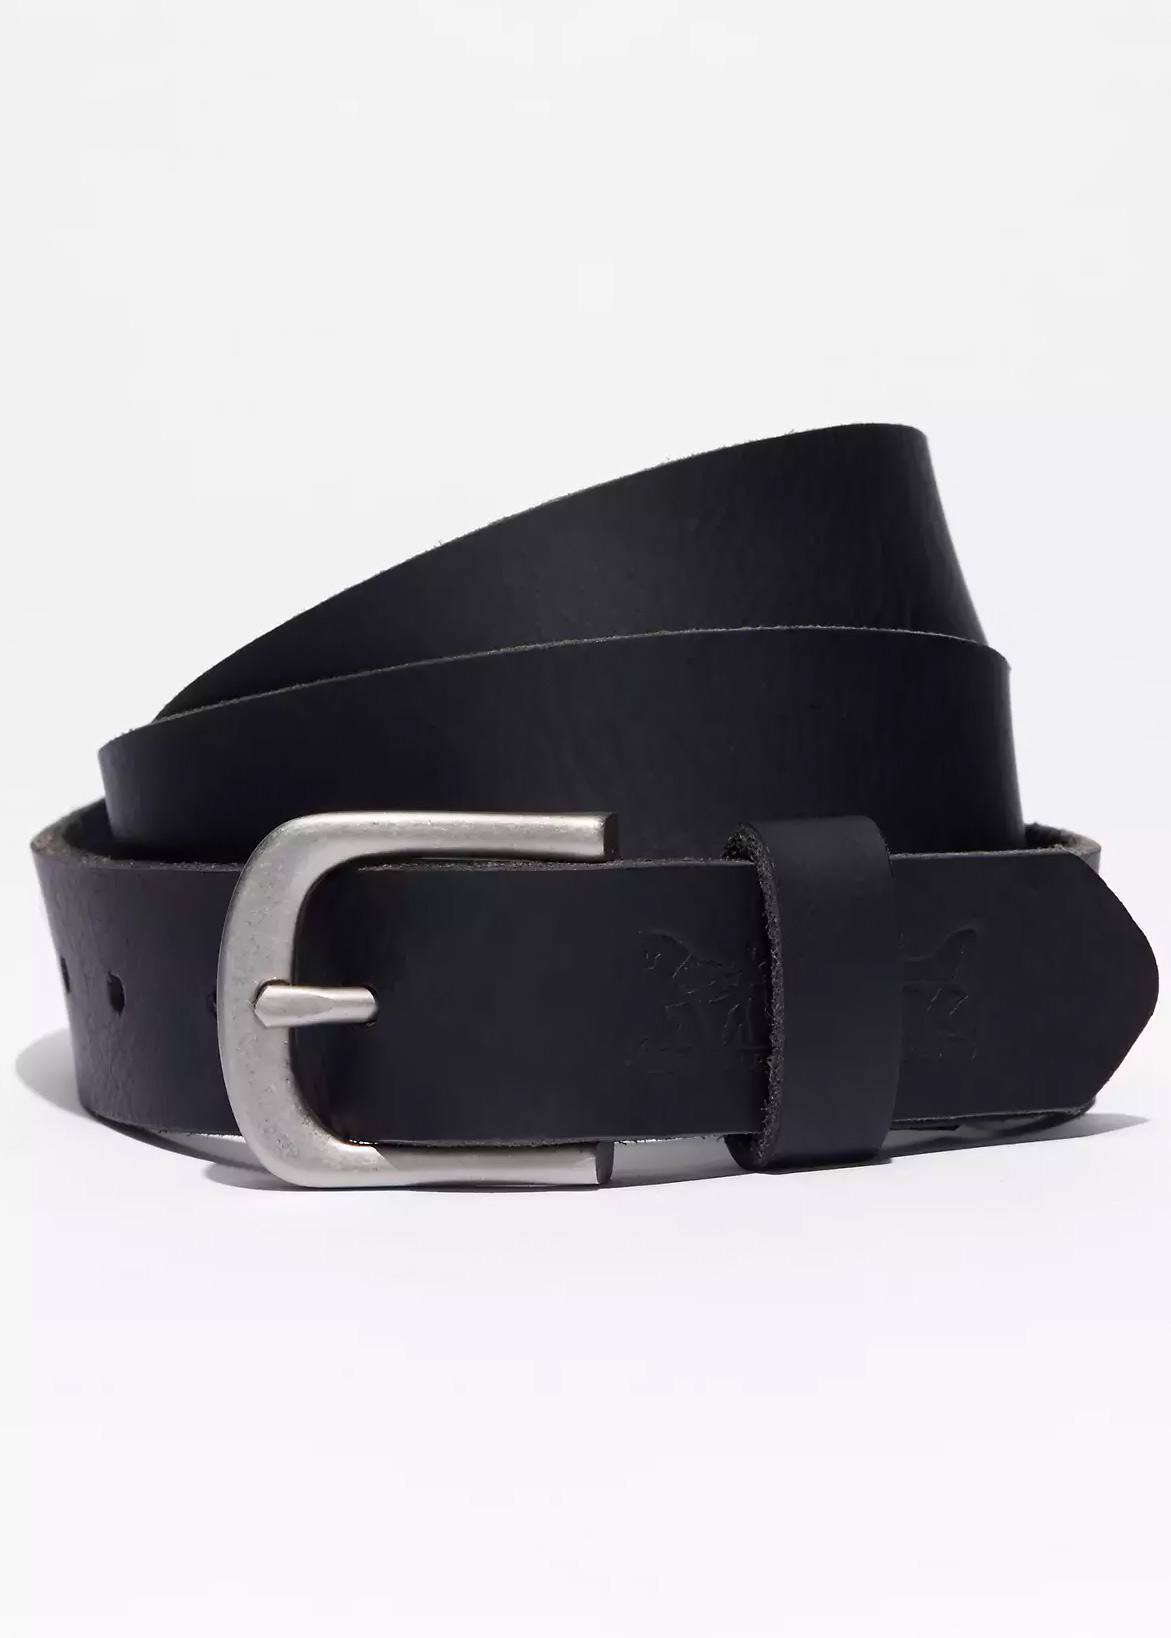 80d2e3feea02d9 Men's Belt Levi's® Woodland Belt - Black (77134-2089) - Jeans24h ...